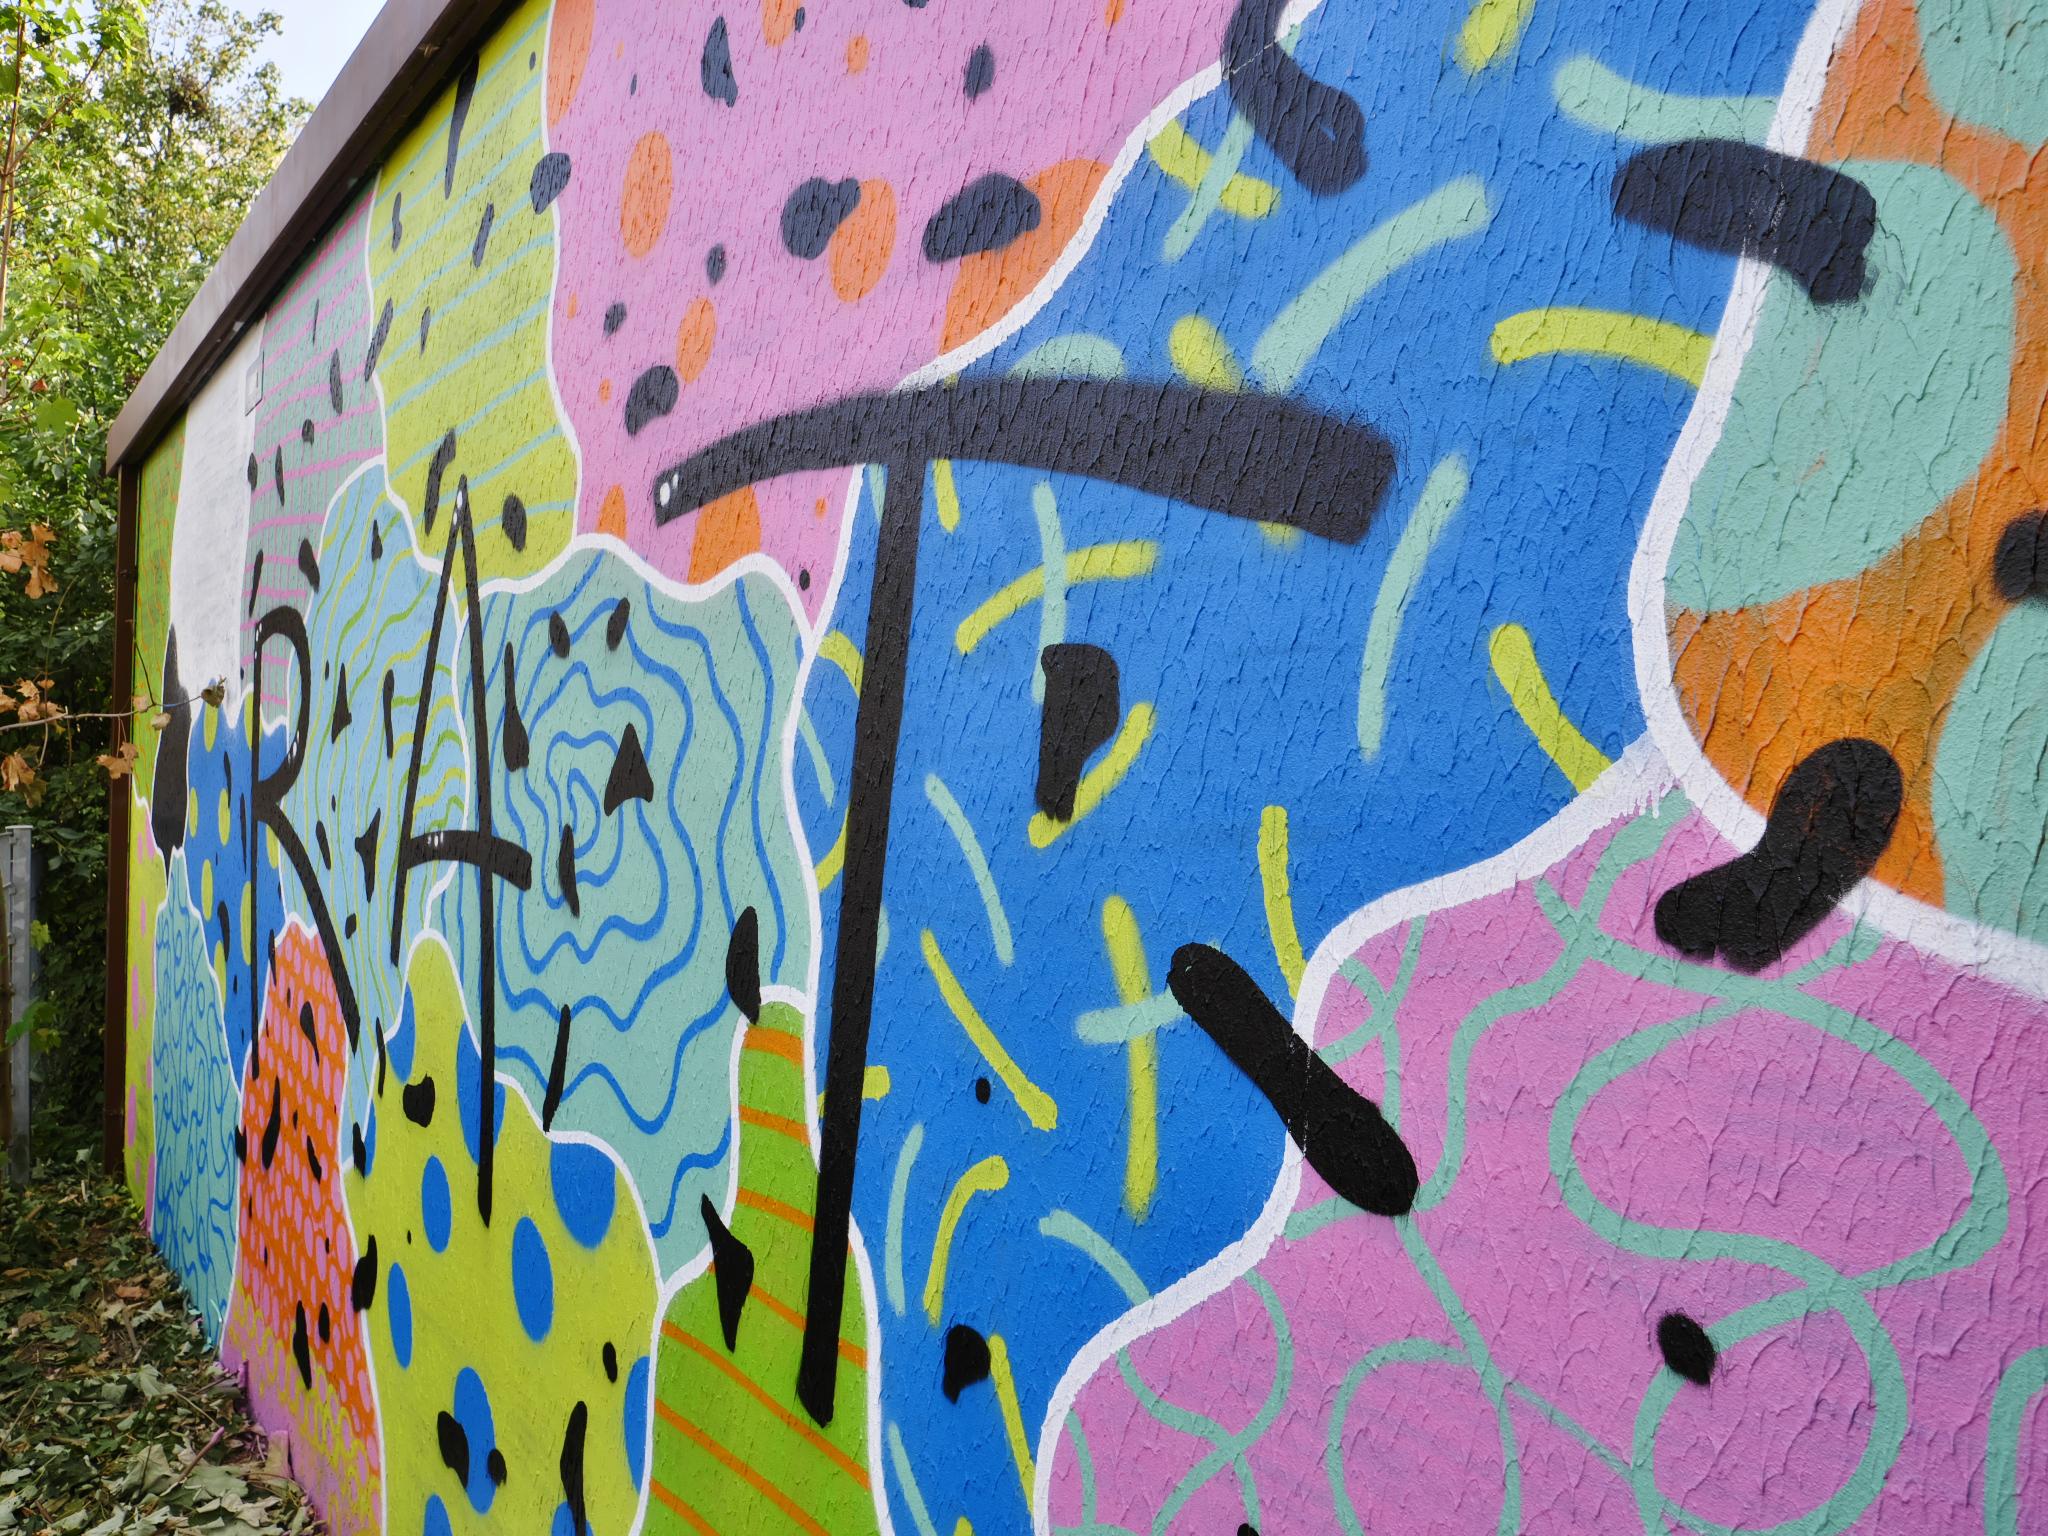 jugendkulturjahr-2020-ratingen-jkj2020-graffiti-trafohaeuschen-stadtwerke-Bild05